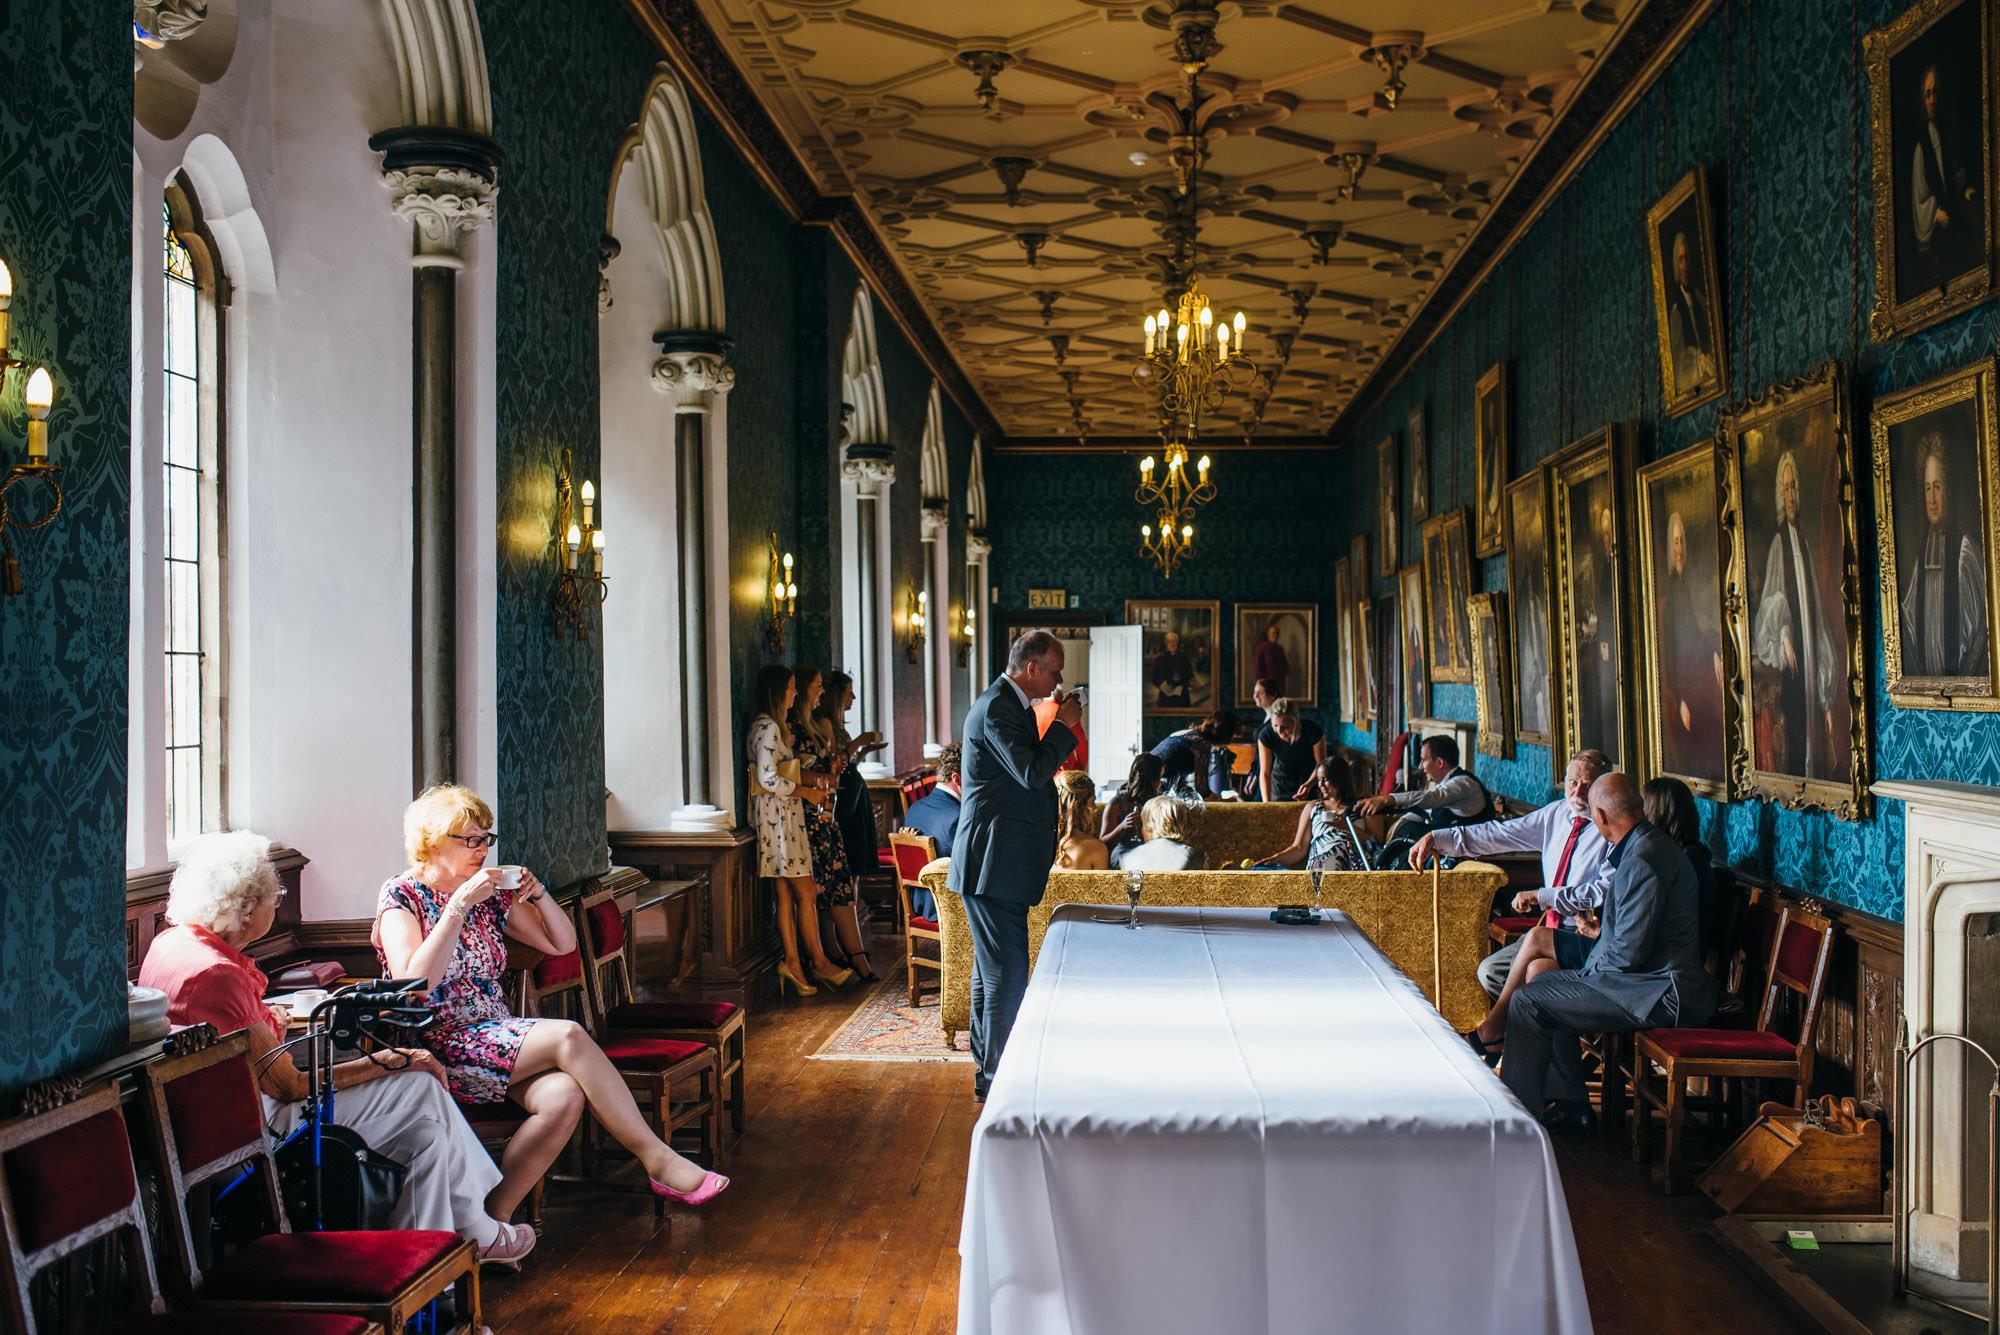 Bishops palace drawing room